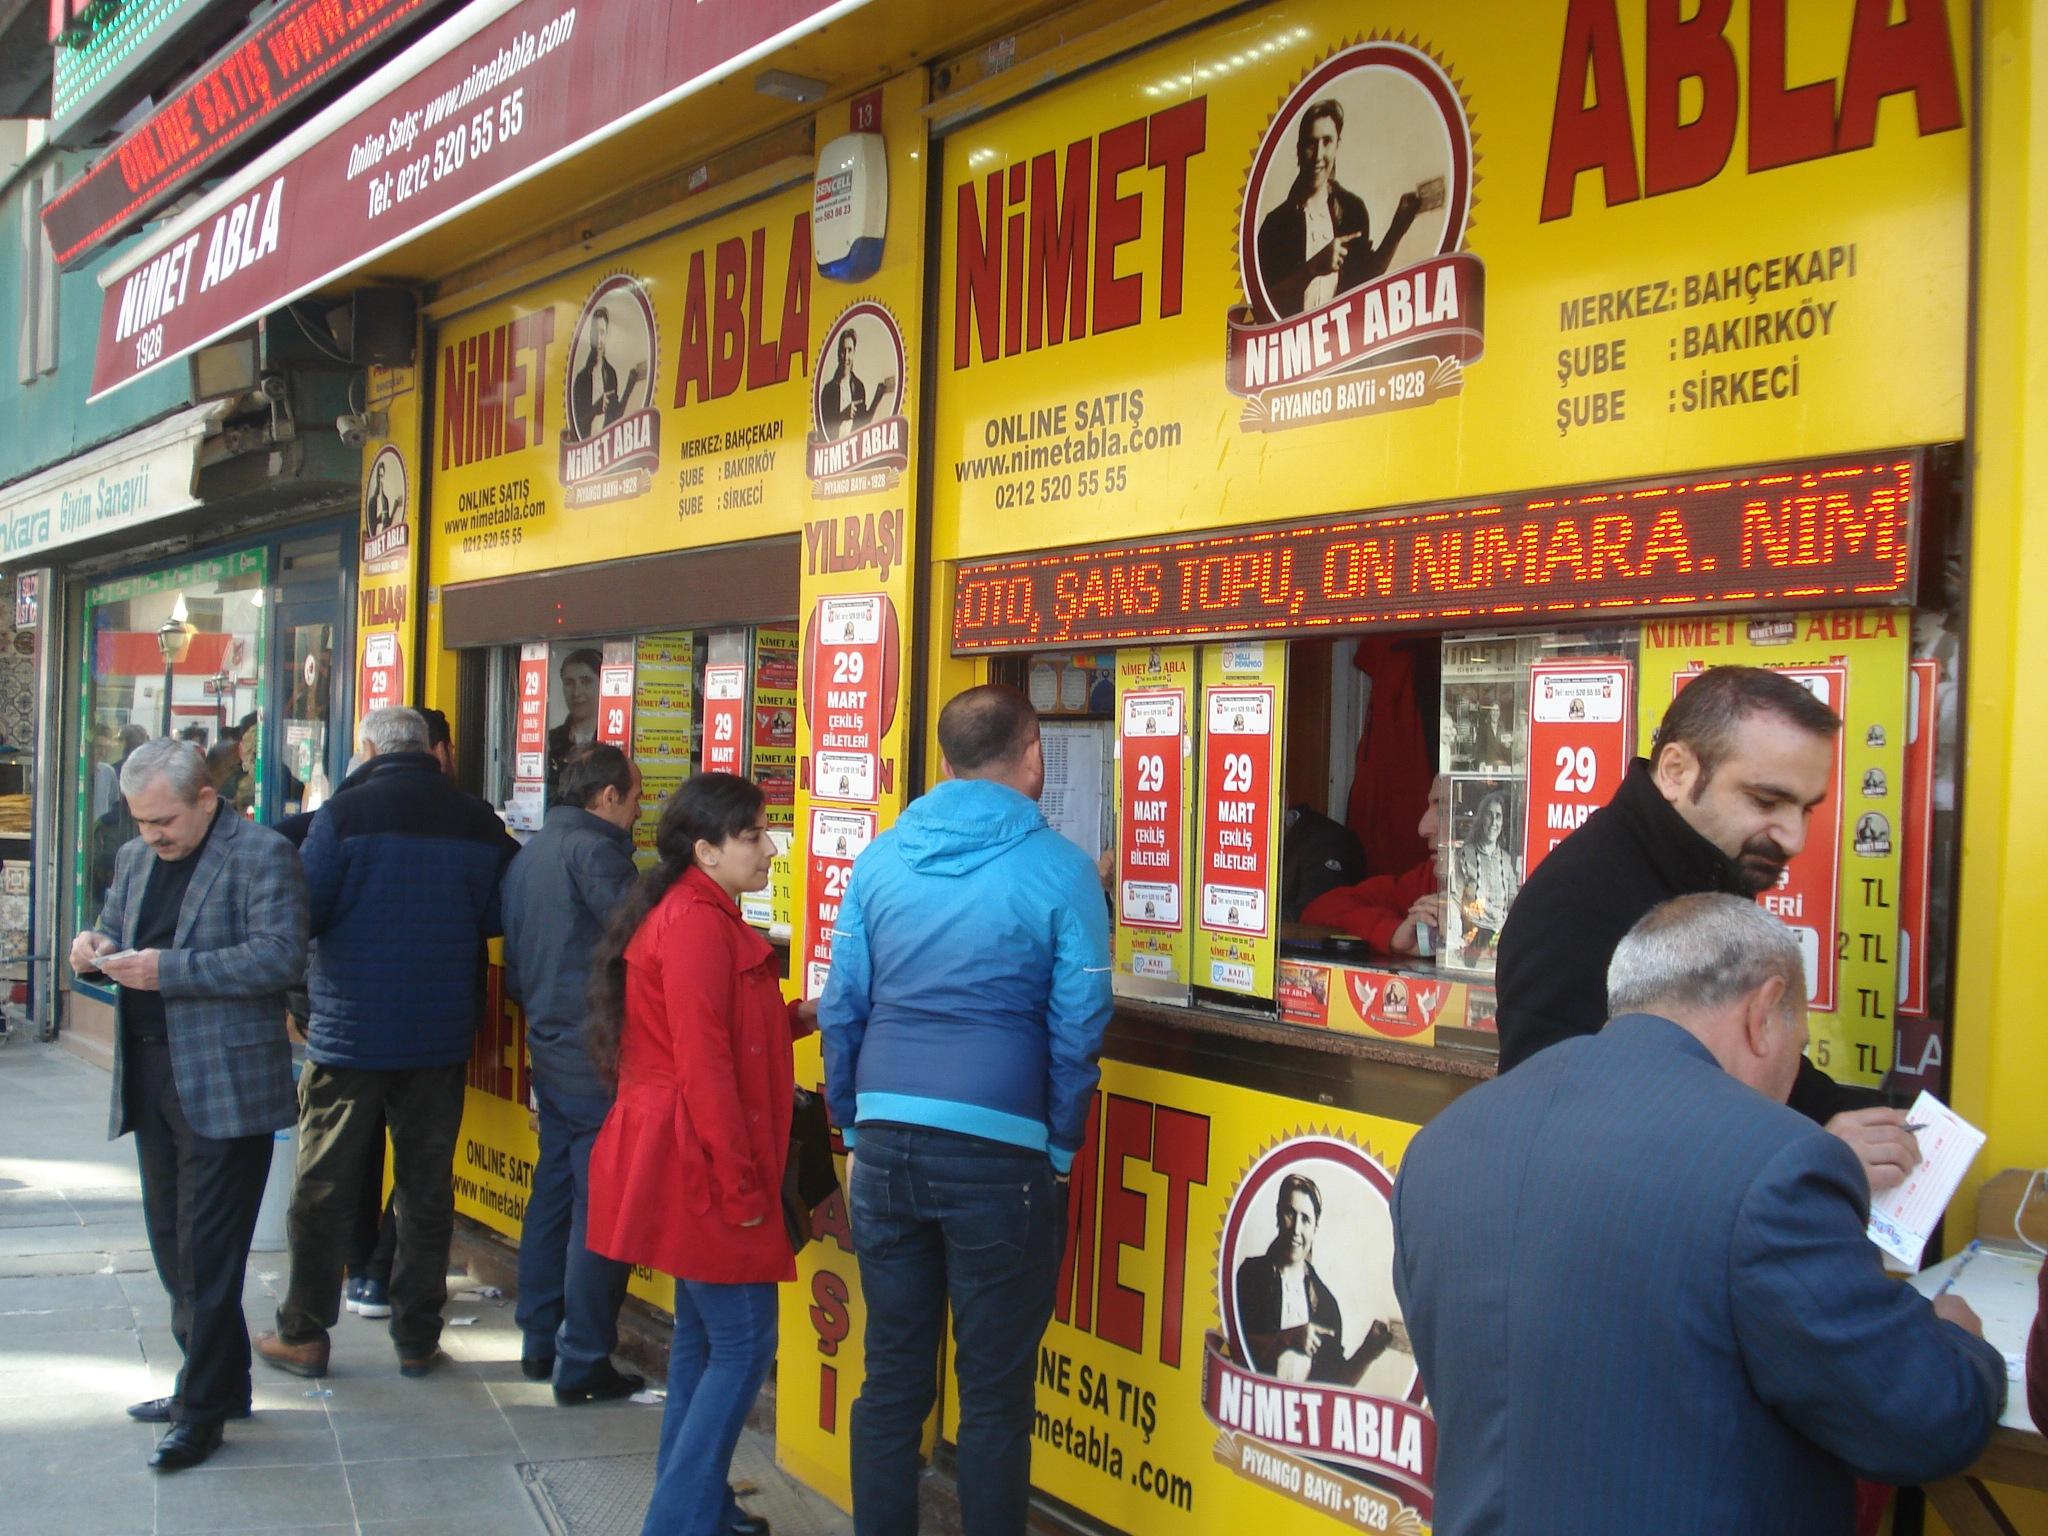 5 - 3/5 .. 90-131 .. İSTANBUL -Lottery Ticket Seller by GÜVEN YENERSOY